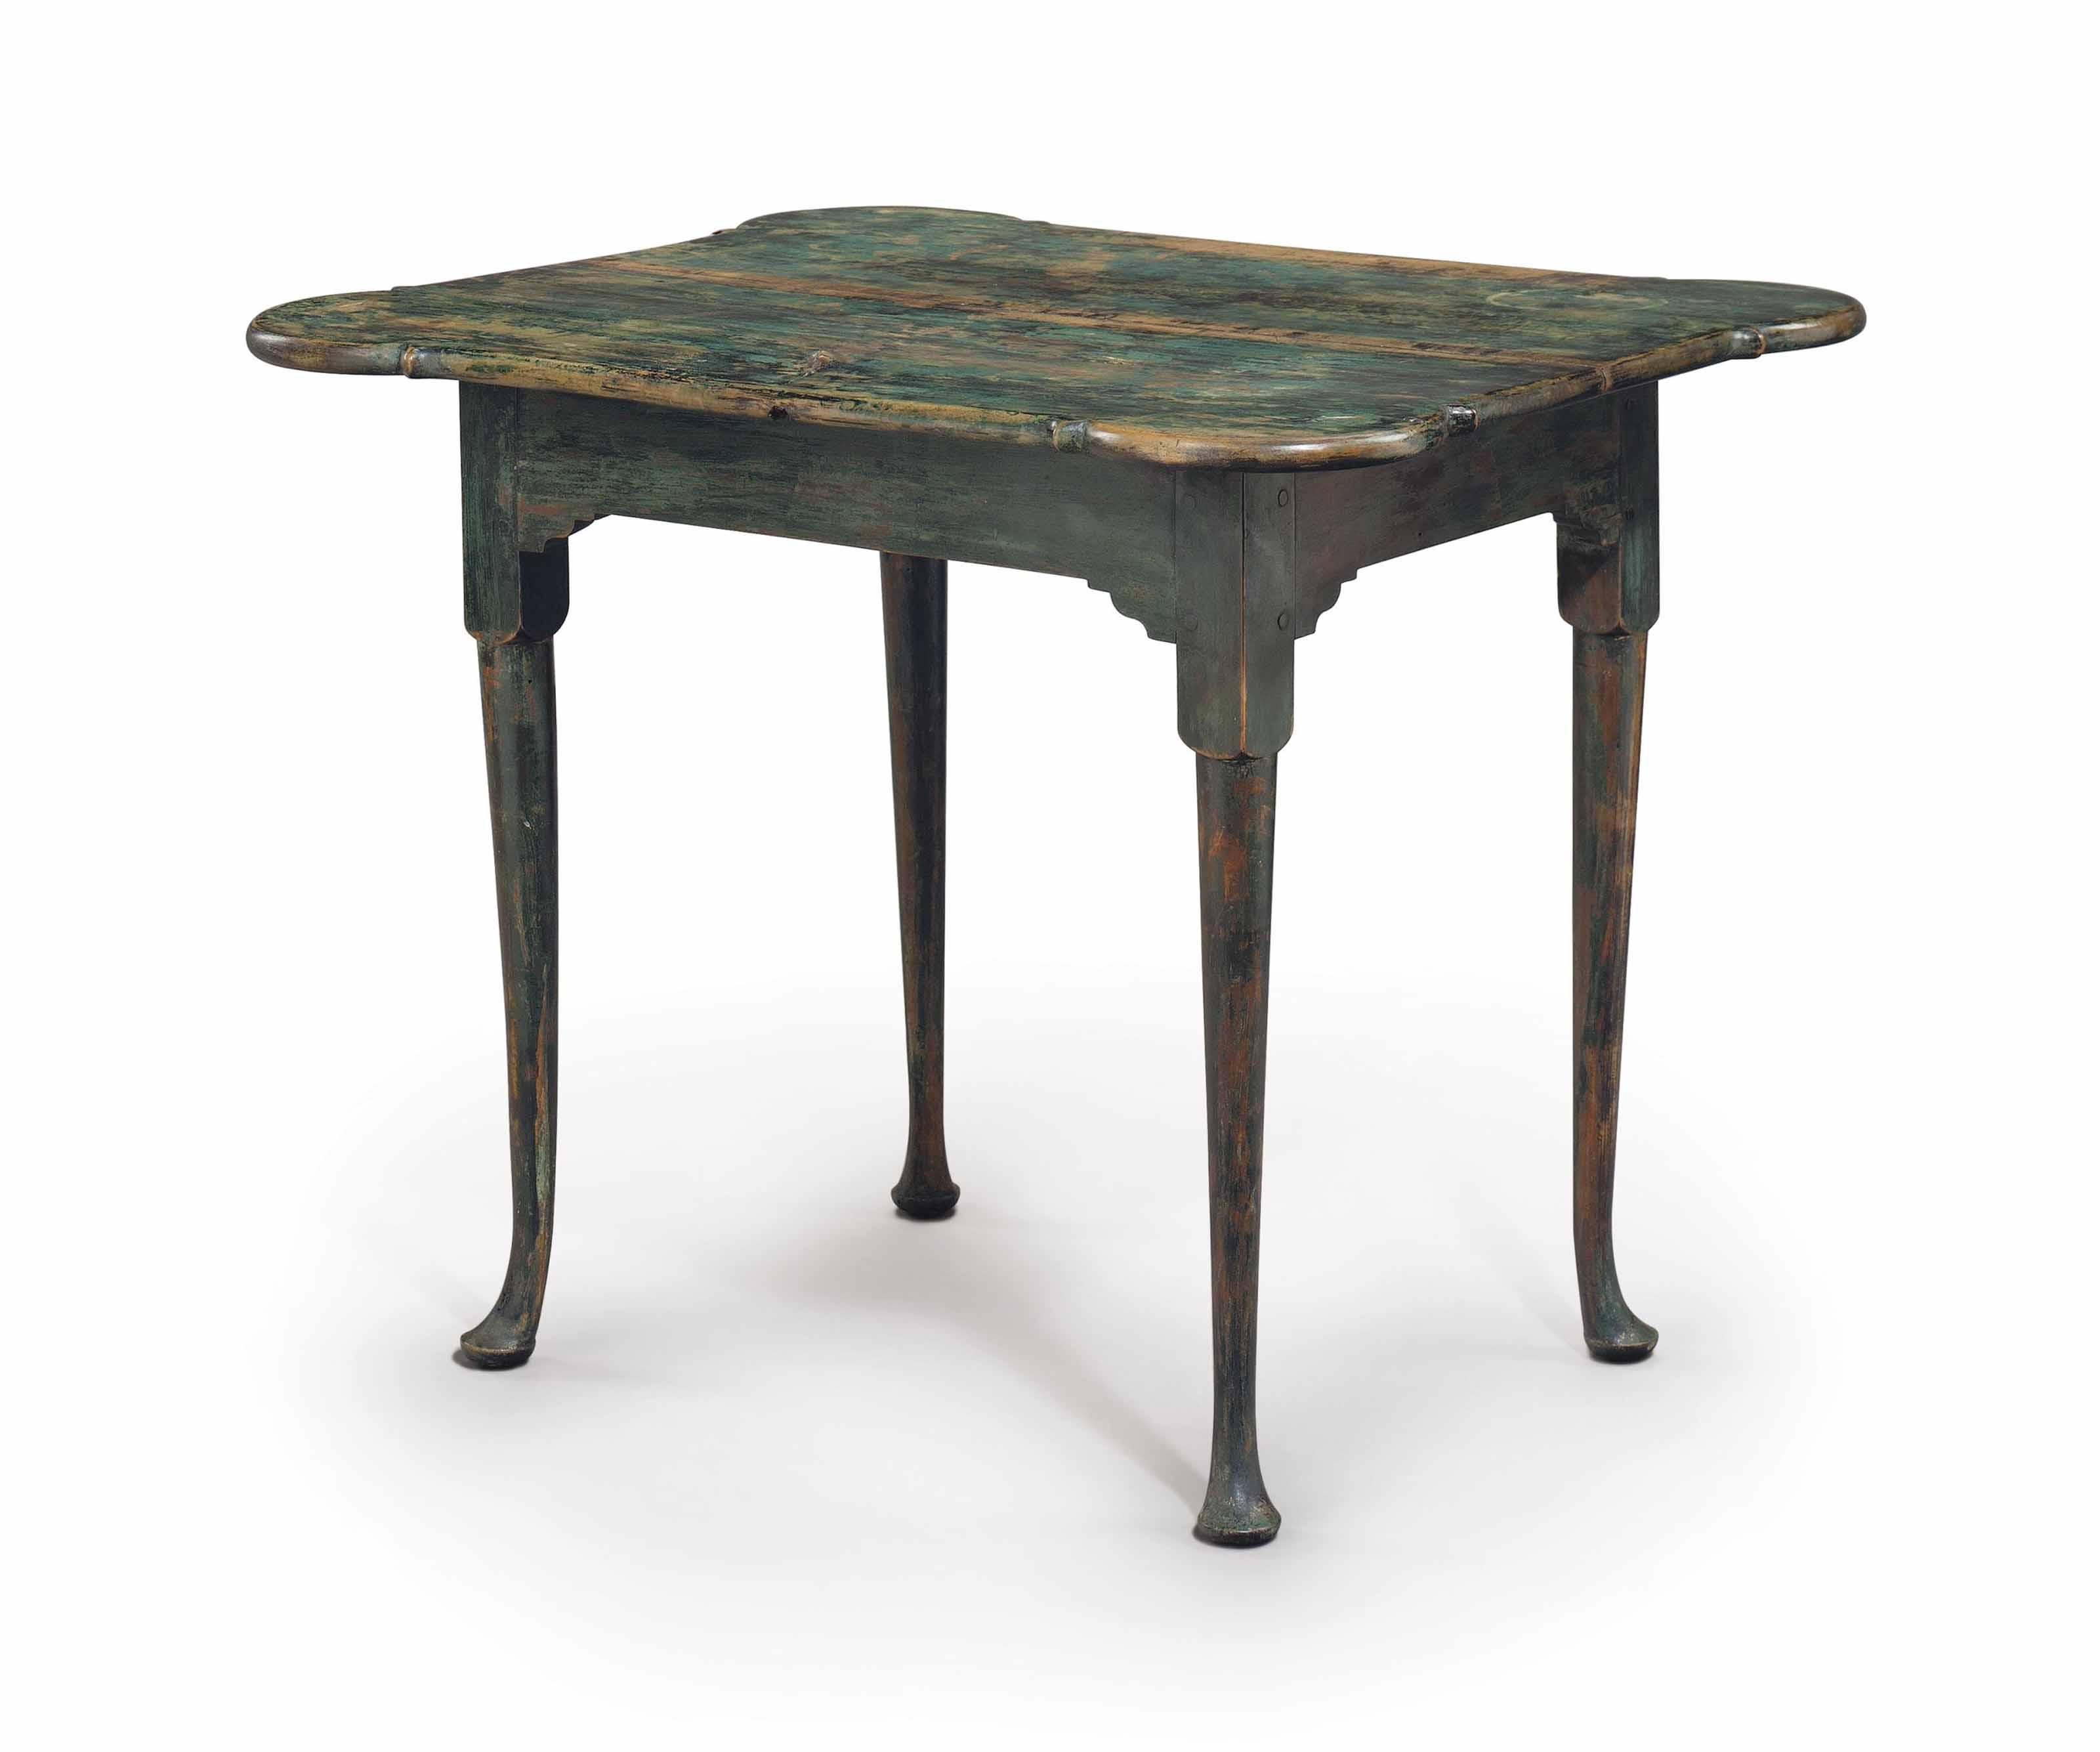 painted queen anne sofa table e cia criciuma a blue green maple porringer top tea lot 172 property of new england family read more